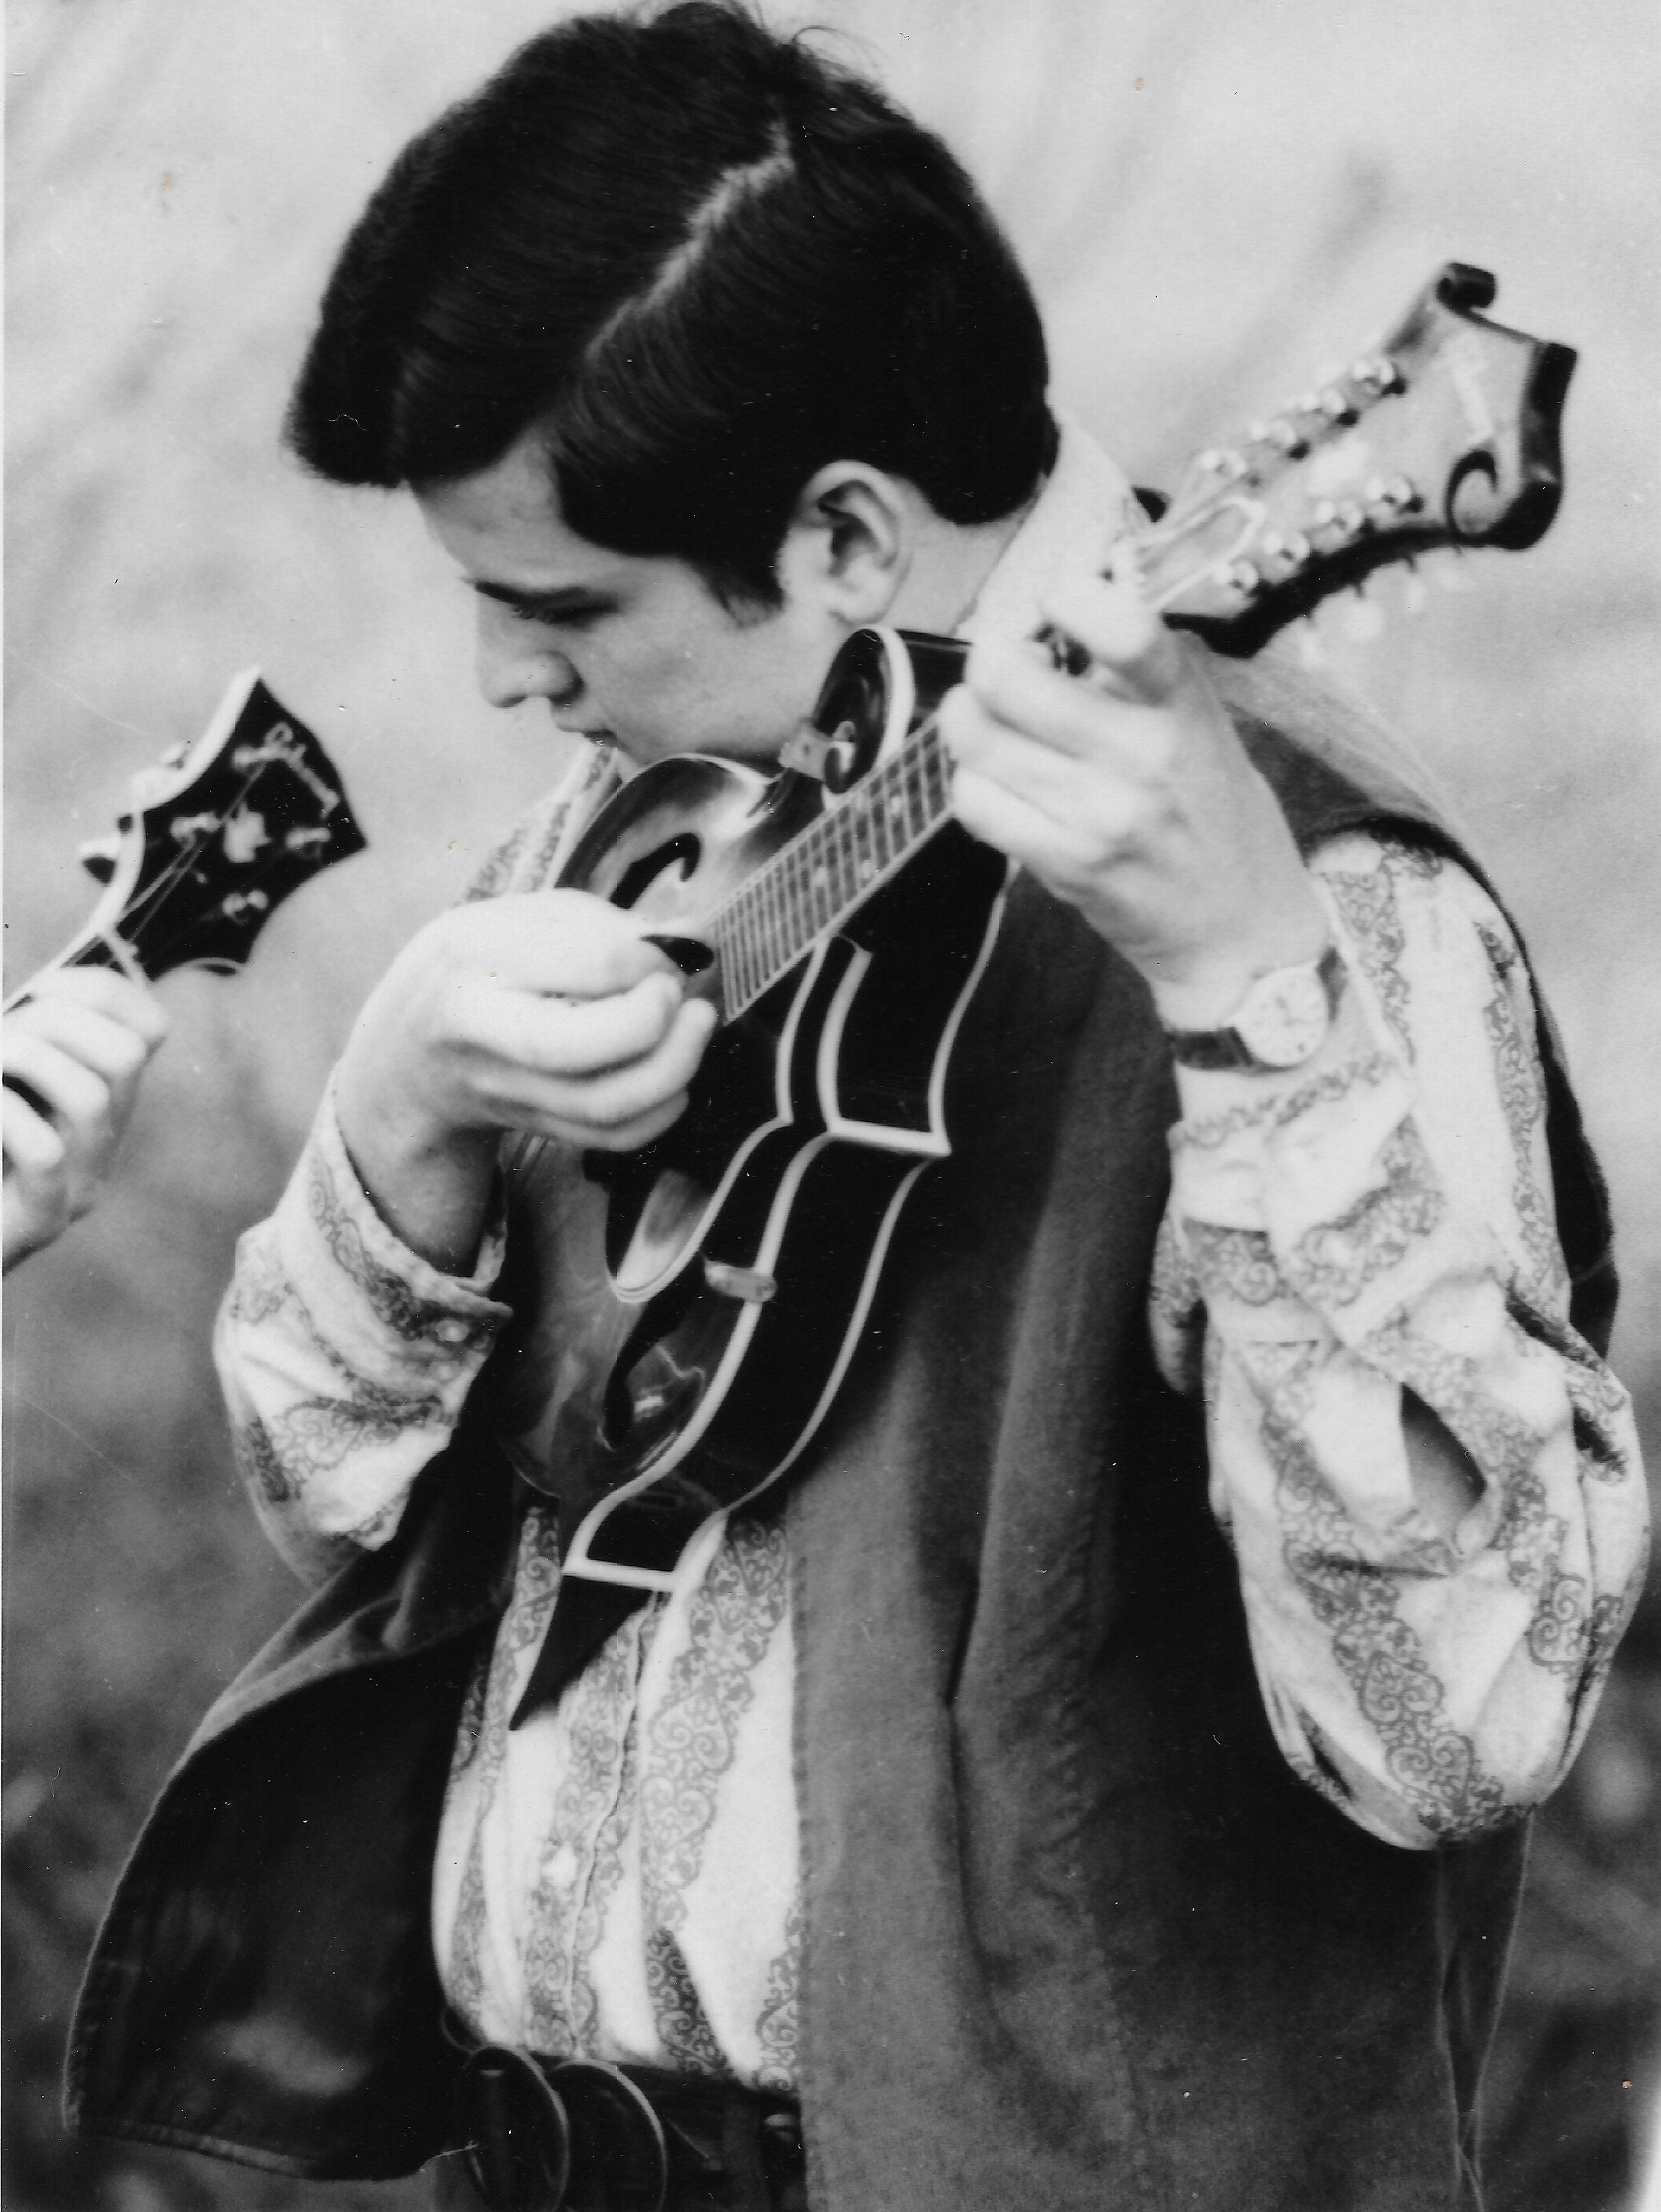 Tony Williamson and his mandolin in 1972.